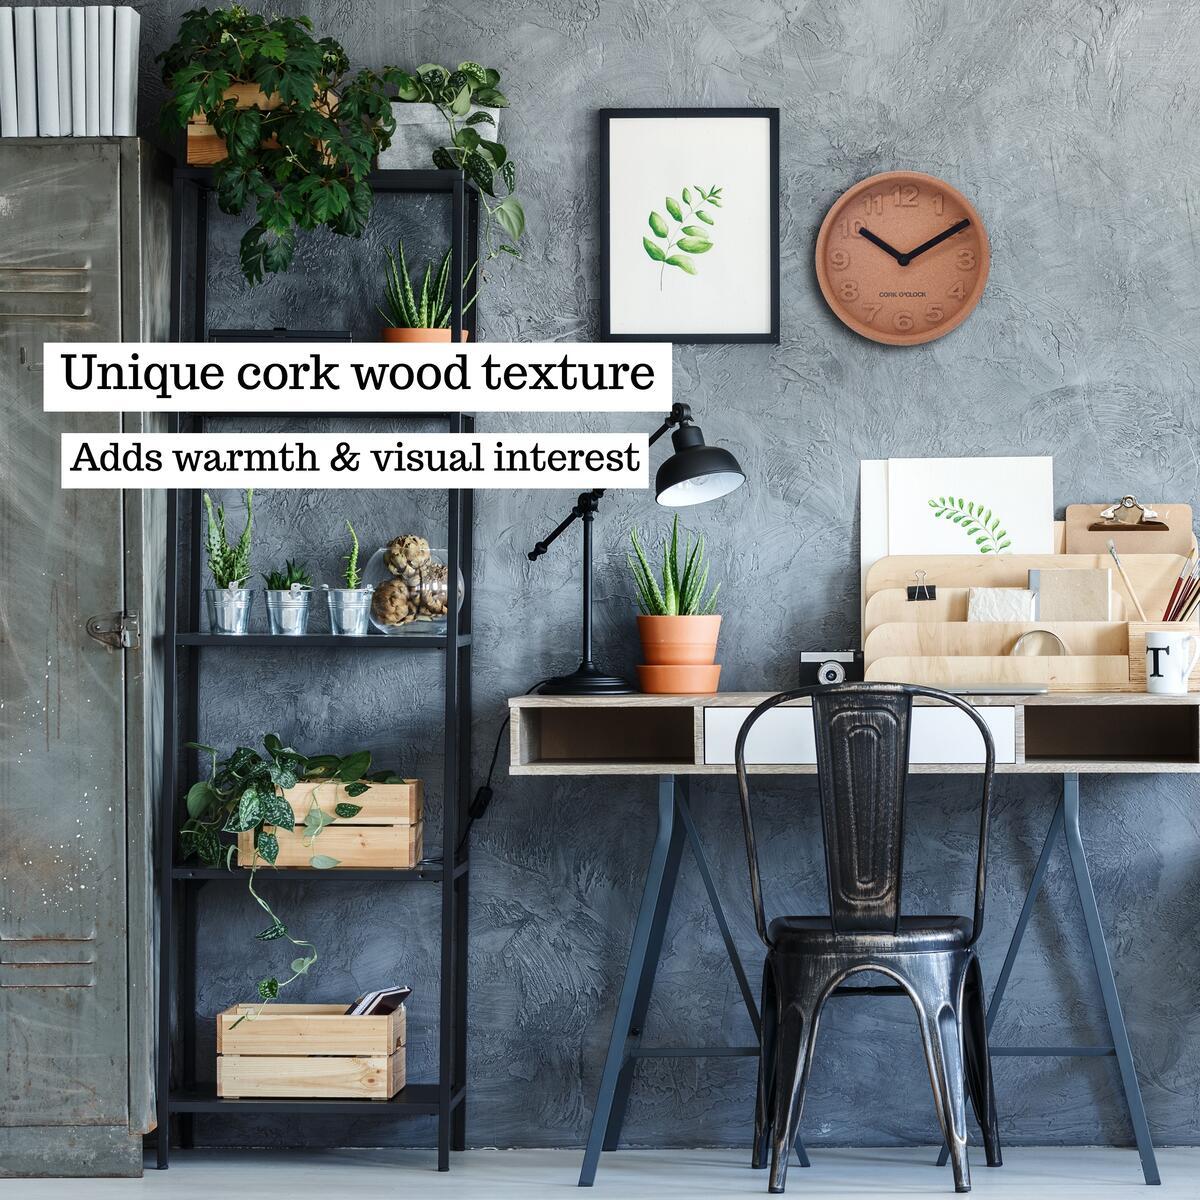 Unique Cork Wood Clock - The CORK O'CLOCK